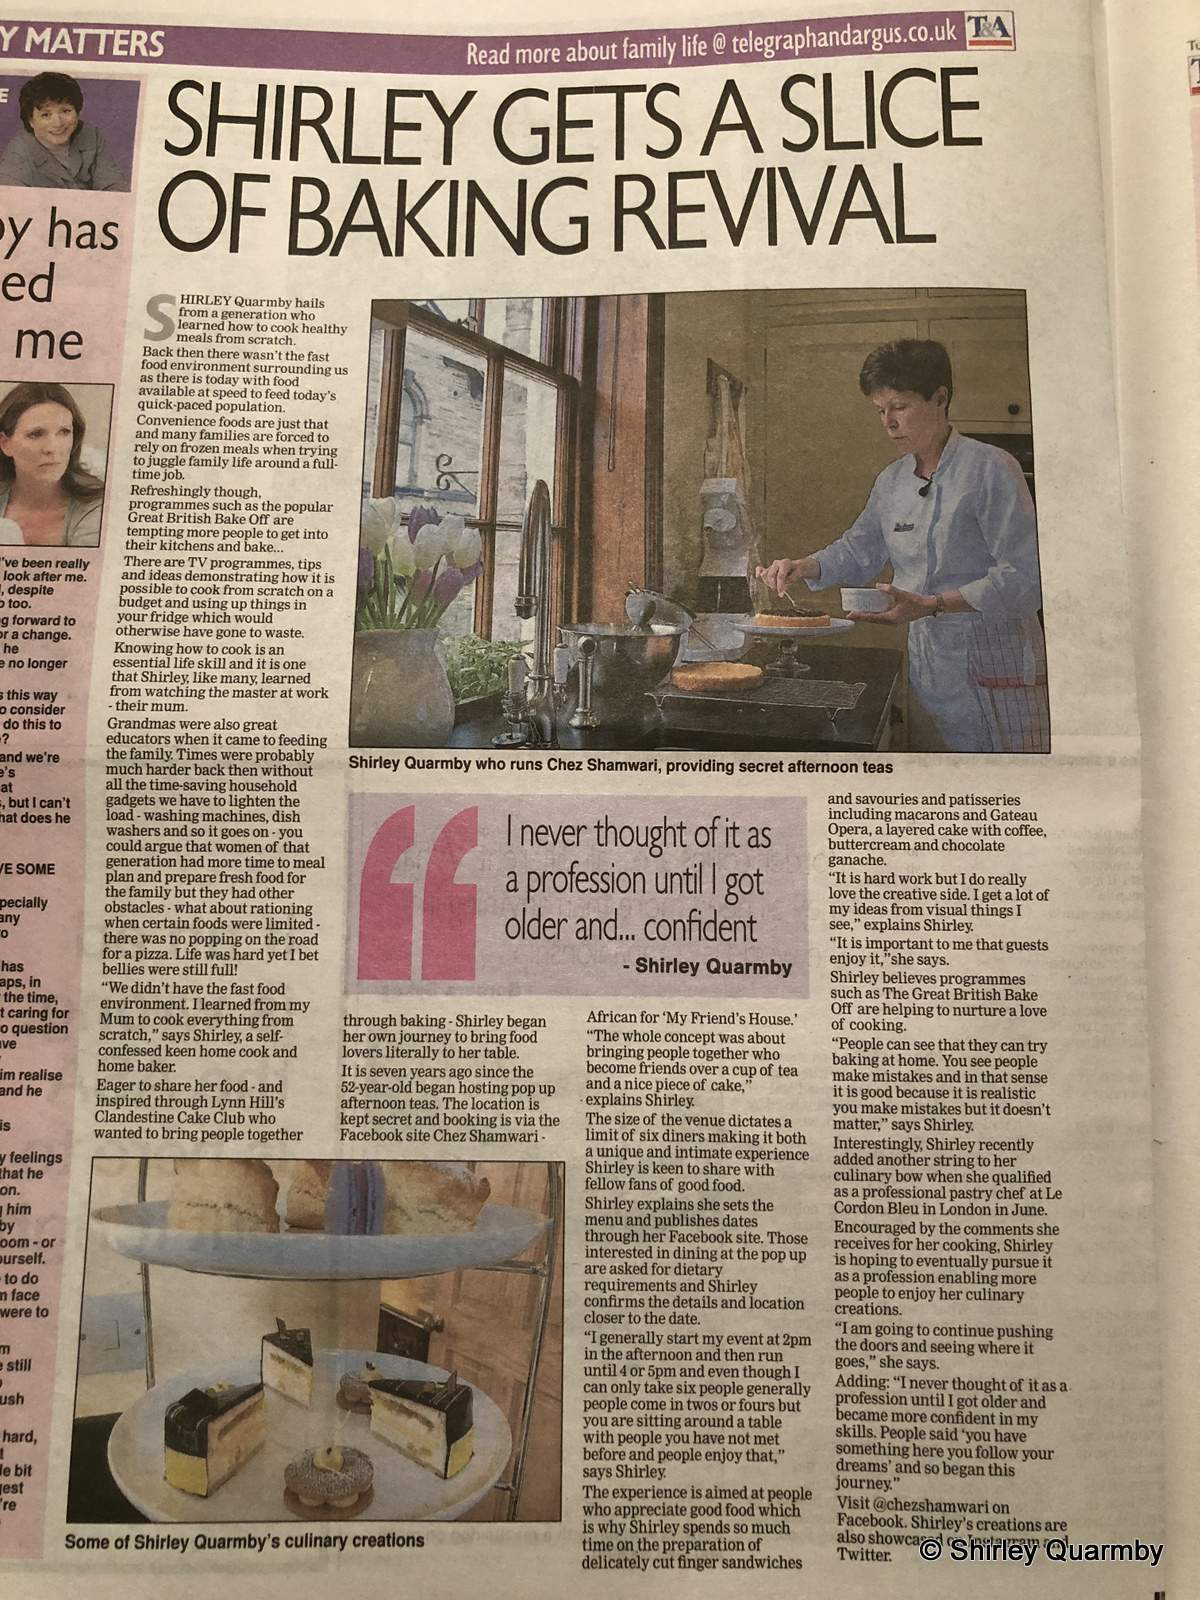 Telegraph & Argus article 23 October 2018